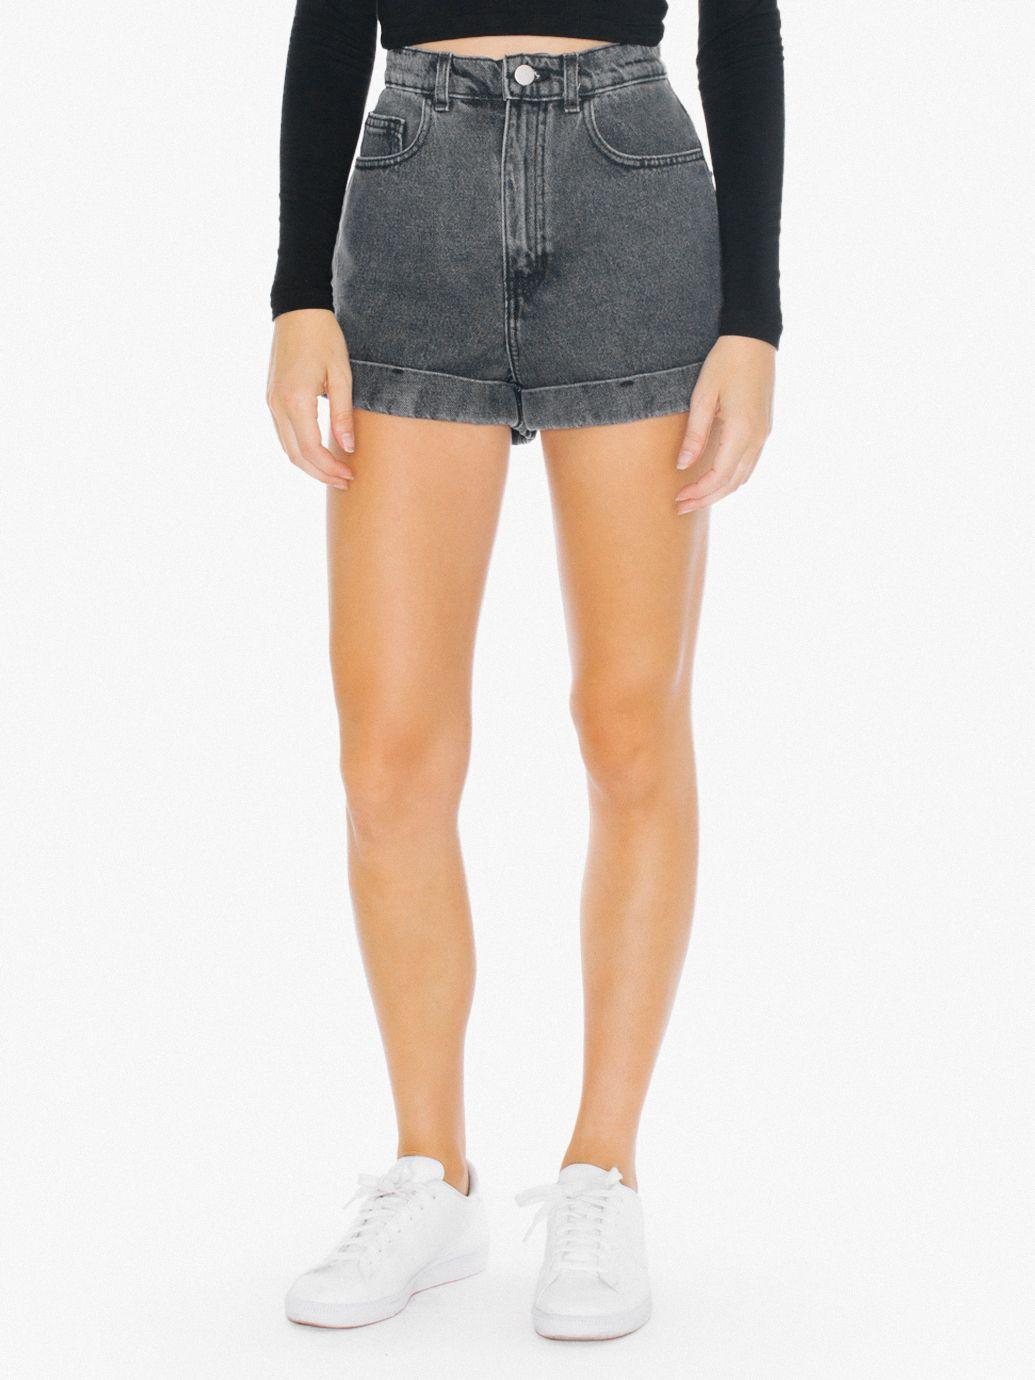 Womens Shorts High Waisted